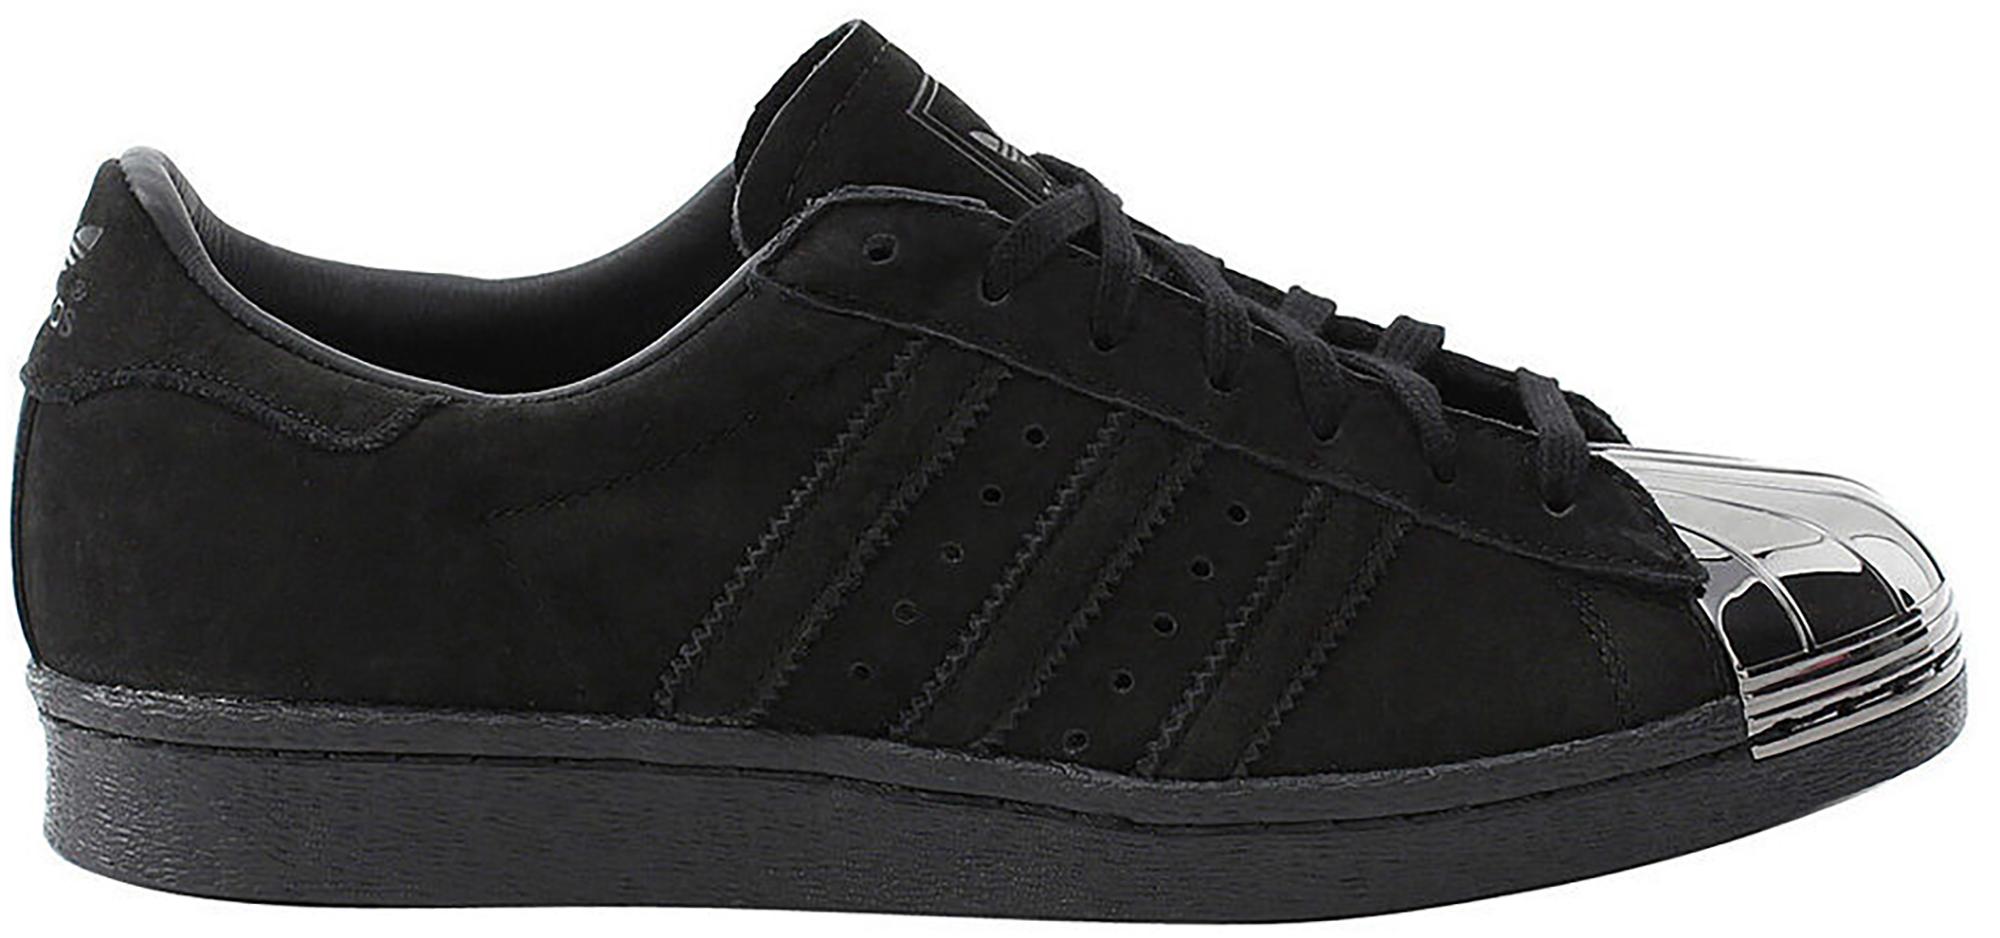 adidas Superstar 80s Metal Toe Black (W